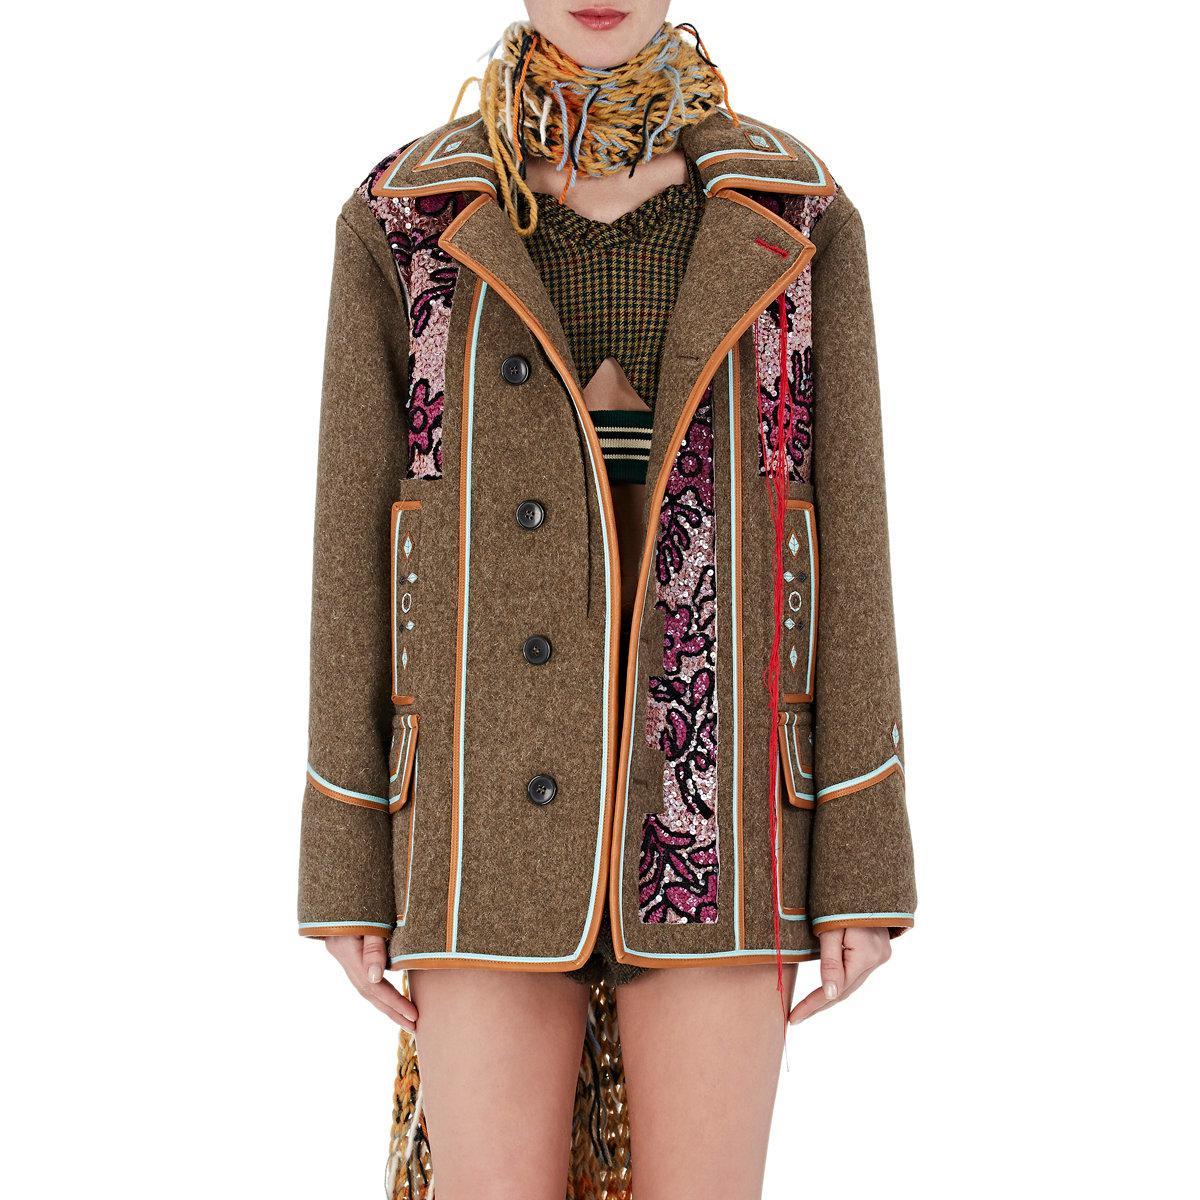 e2315d7e290 Lyst - Maison Margiela Sequined Wool Melton Coat in Green